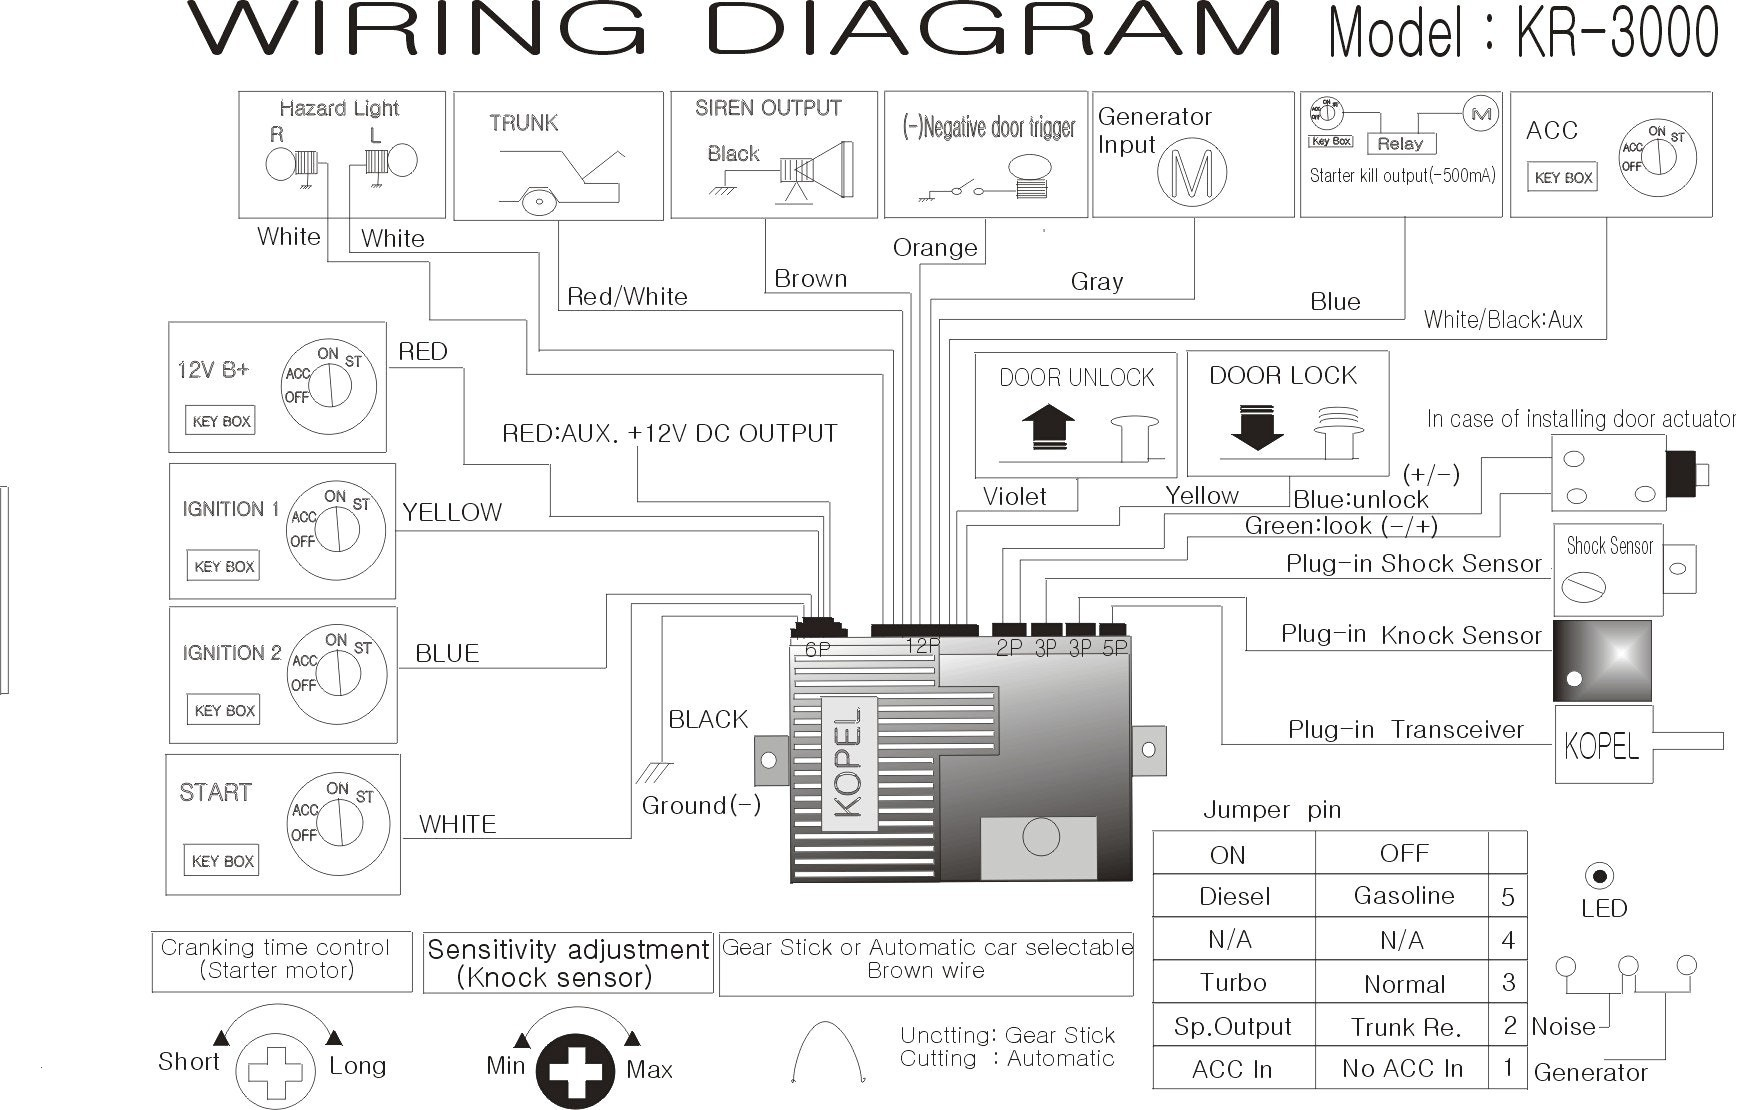 hight resolution of pioneer avh p2400bt wiring harness diagram residential electrical pioneer avh x2500bt at pioneer avh p2400bt wire